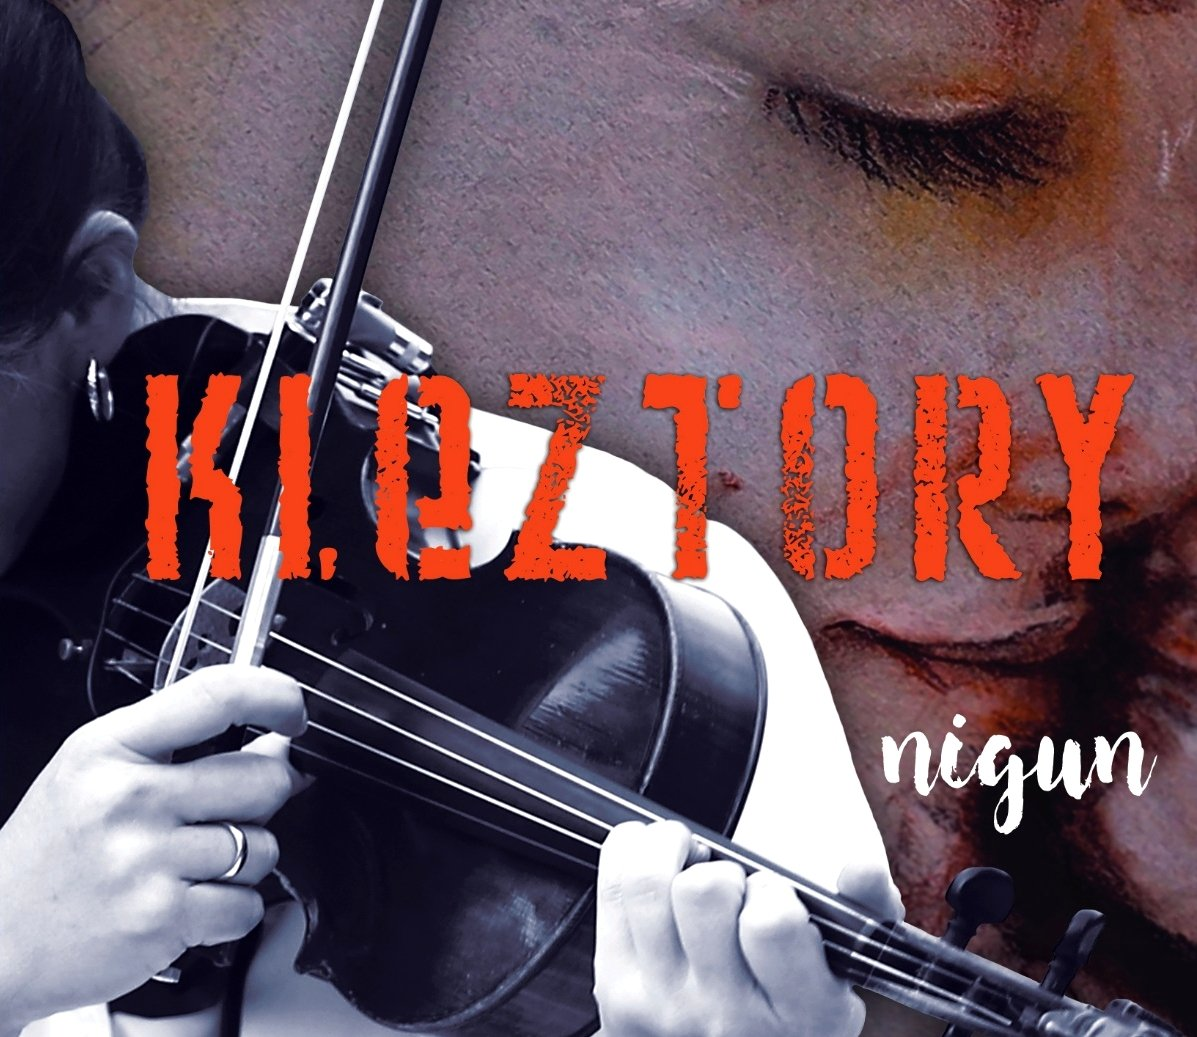 Kleztory– Nigun